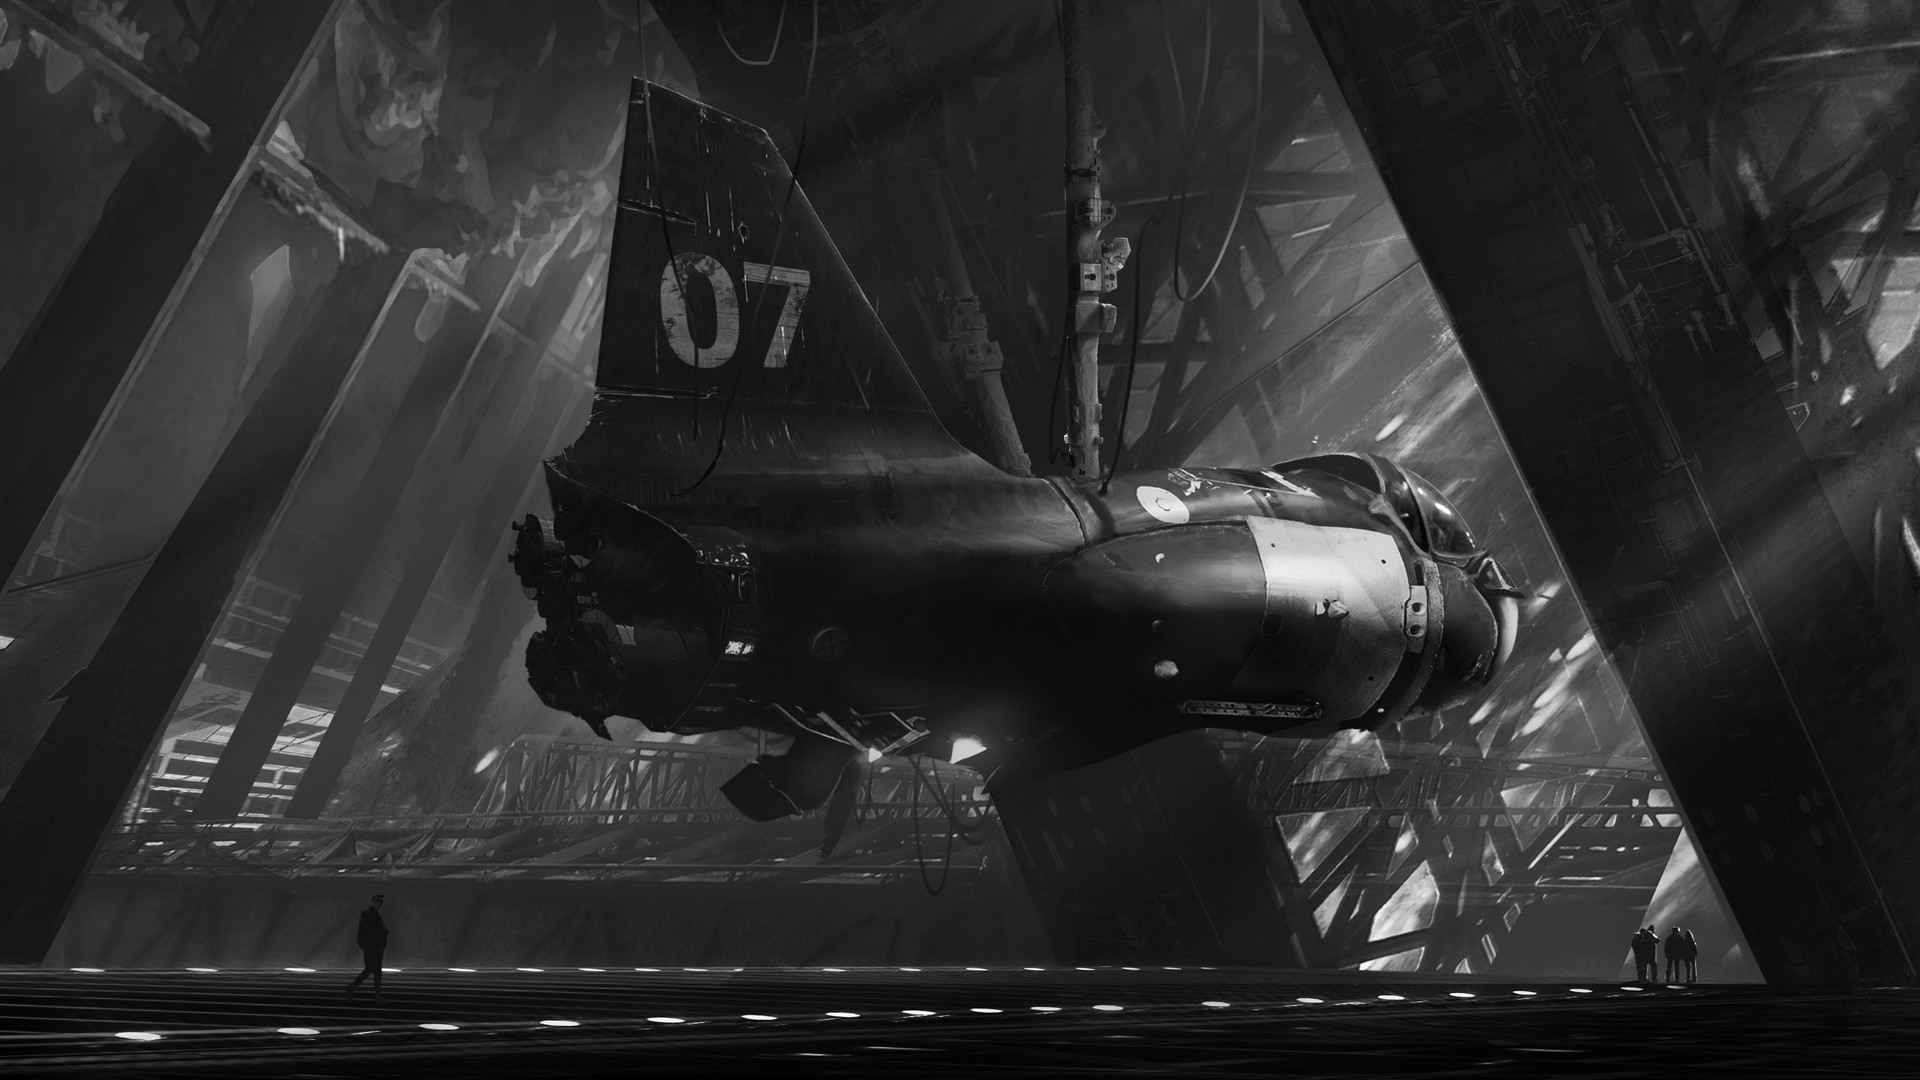 Ivan vujovic ship hangar